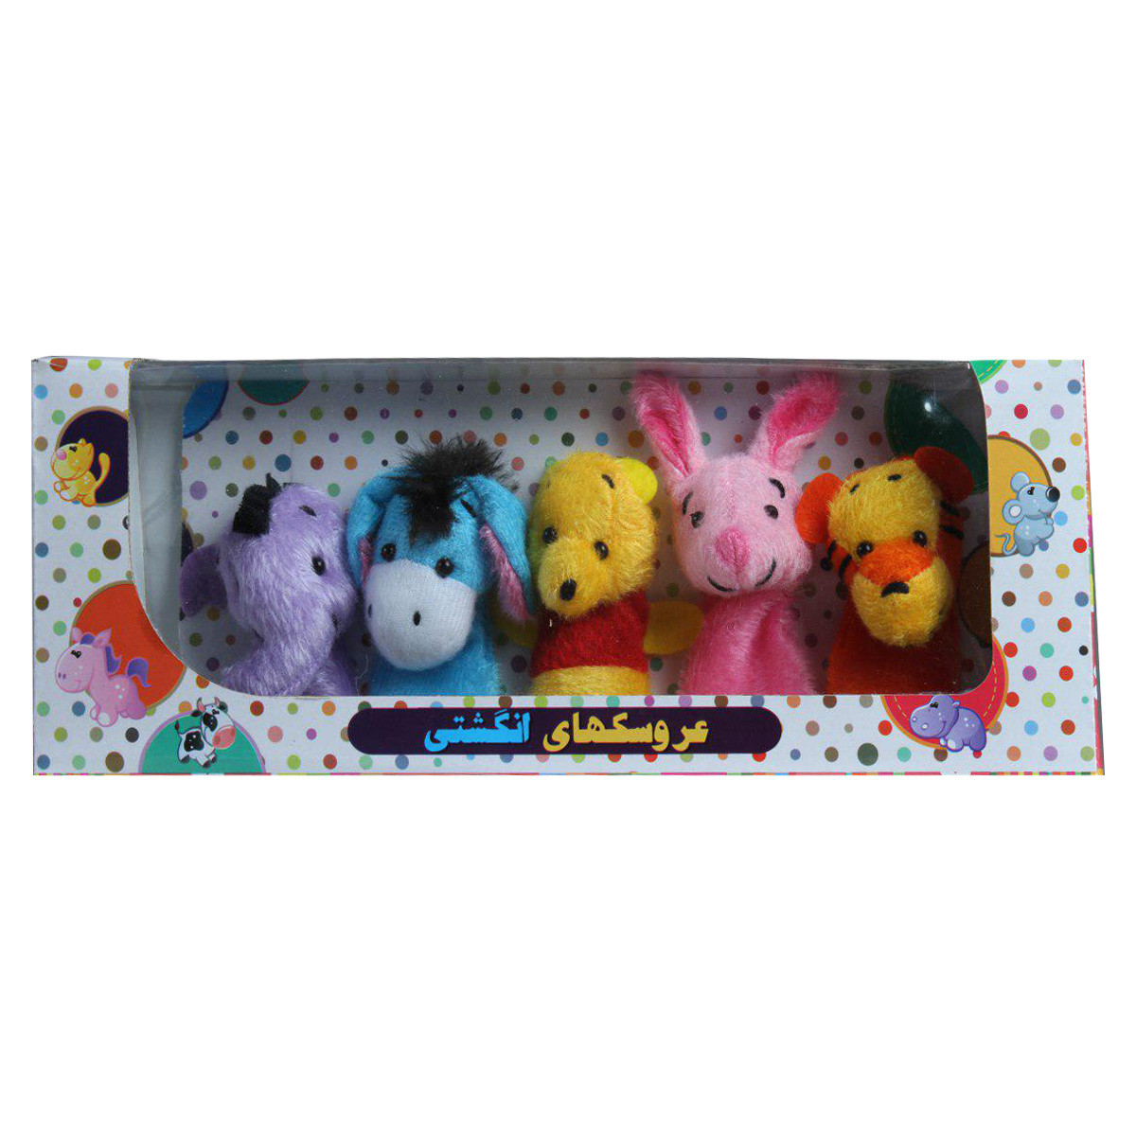 عروسک پنج انگشتی ام دی تویز MD Toys Finger Puppets Model Pooh Pack Of 5